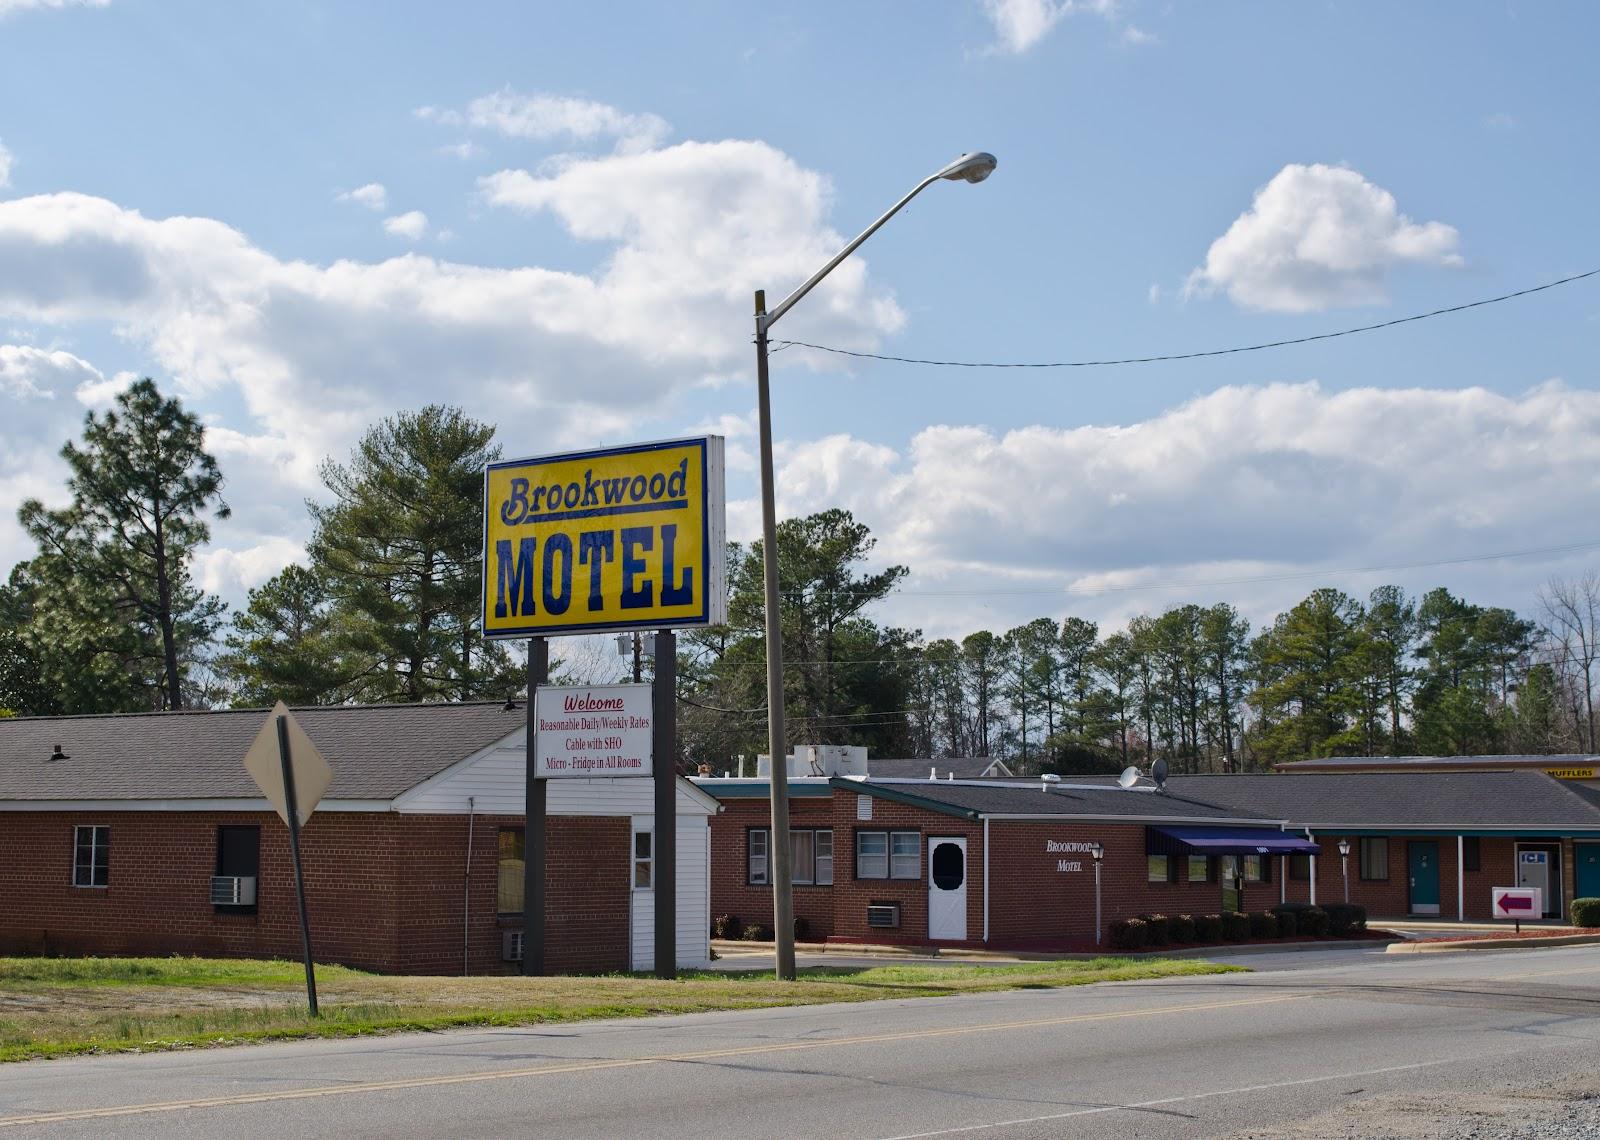 Motor Lodge Brookwood Motel Roanoke Rapids